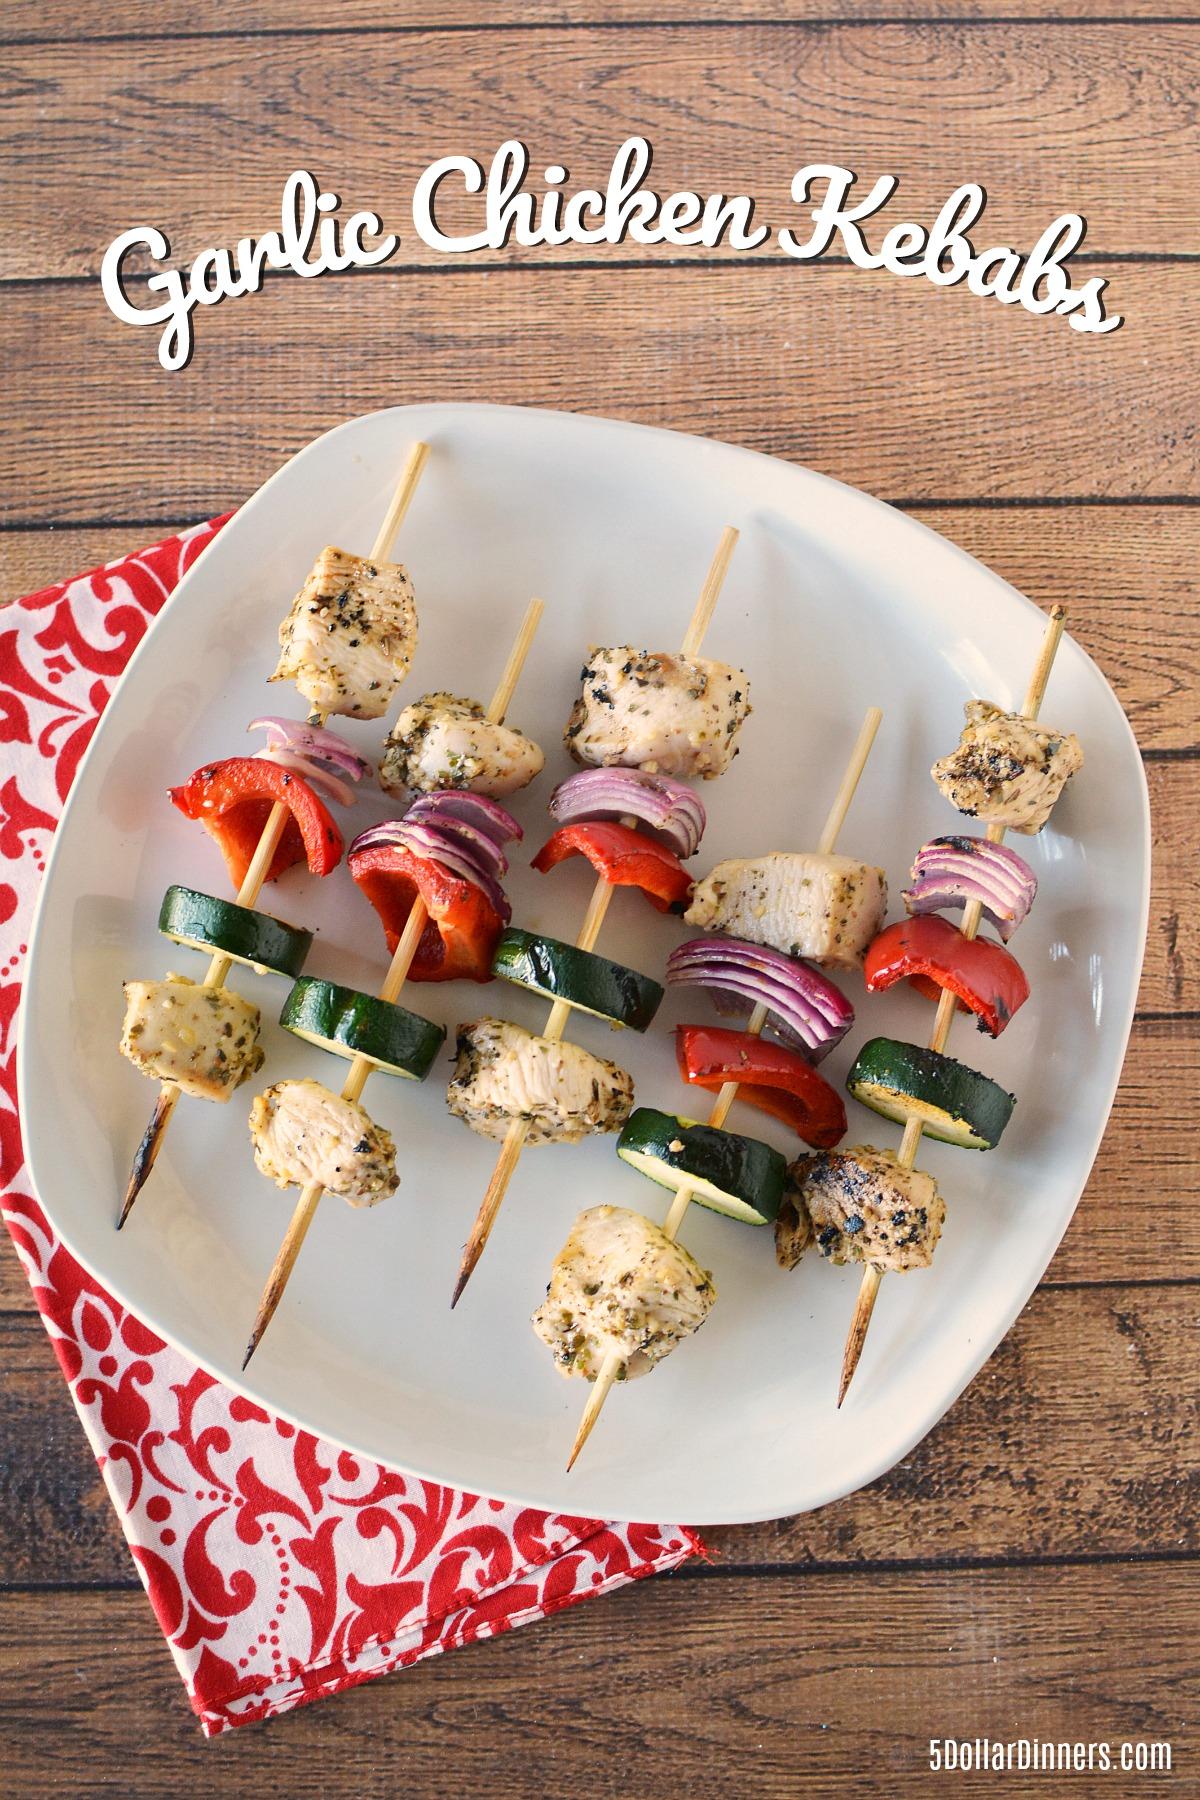 Grilled Garlic Chicken Kebabs Recipe from 5DollarDinners.com